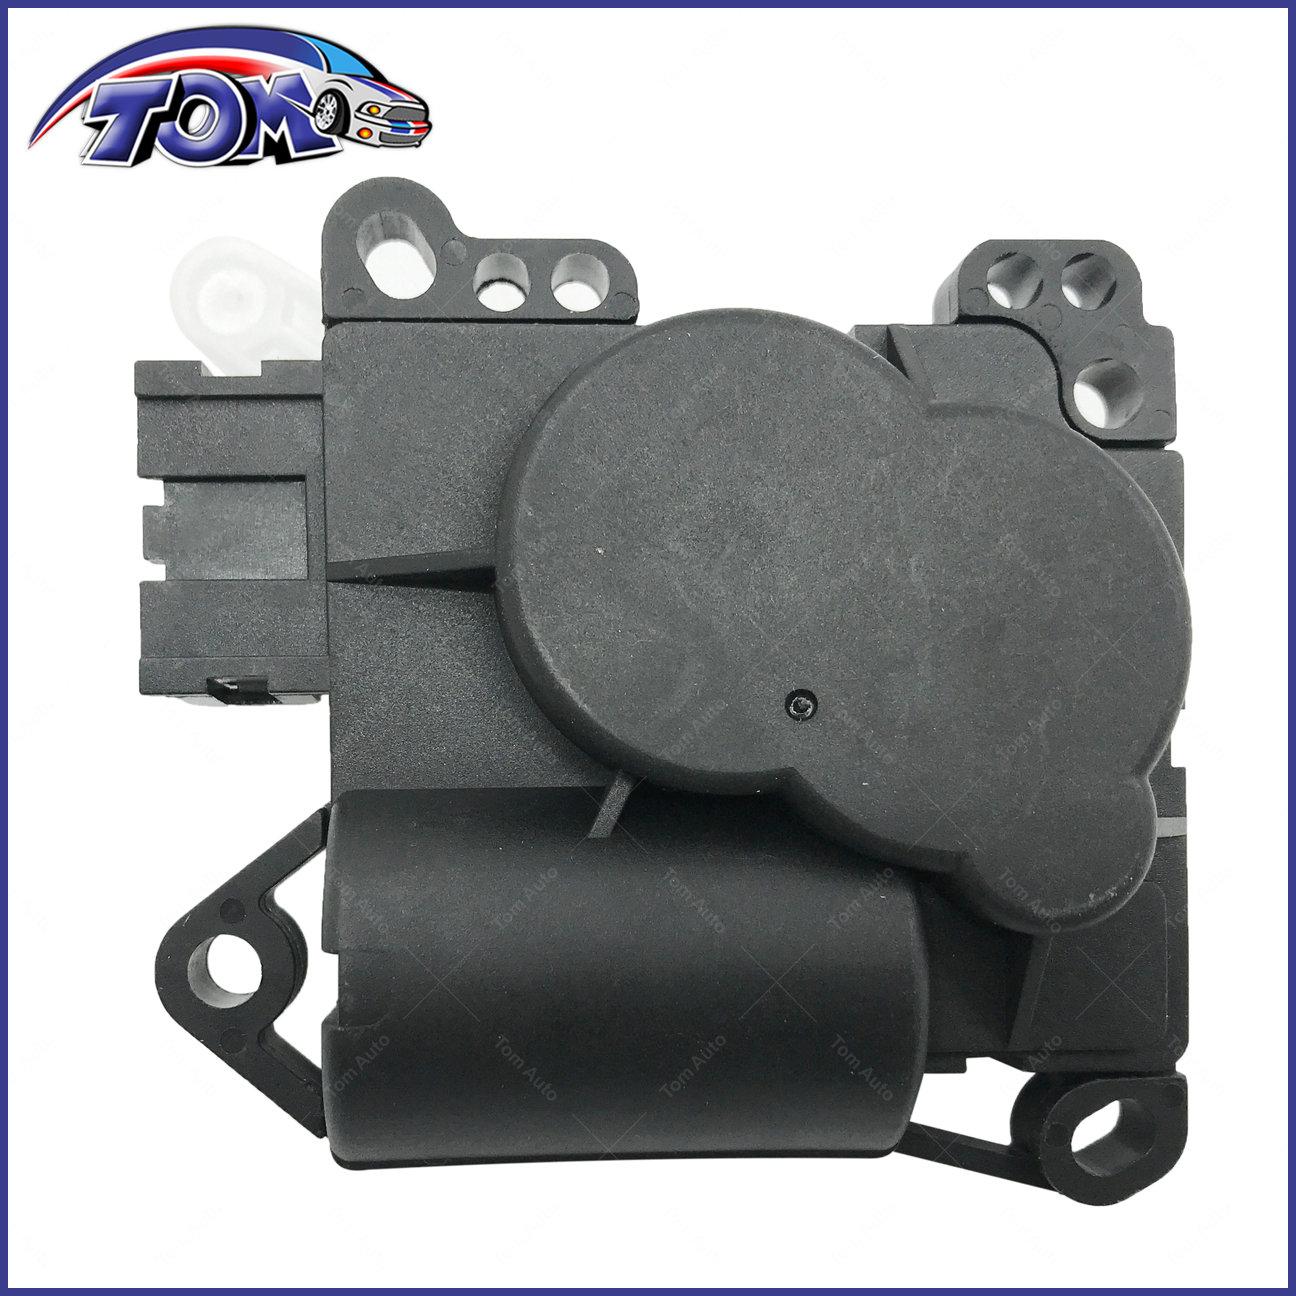 HVAC Heater Blend Air Door Actuator Fits 03-11 Lincoln Town Car 4.6L-V8,604-212